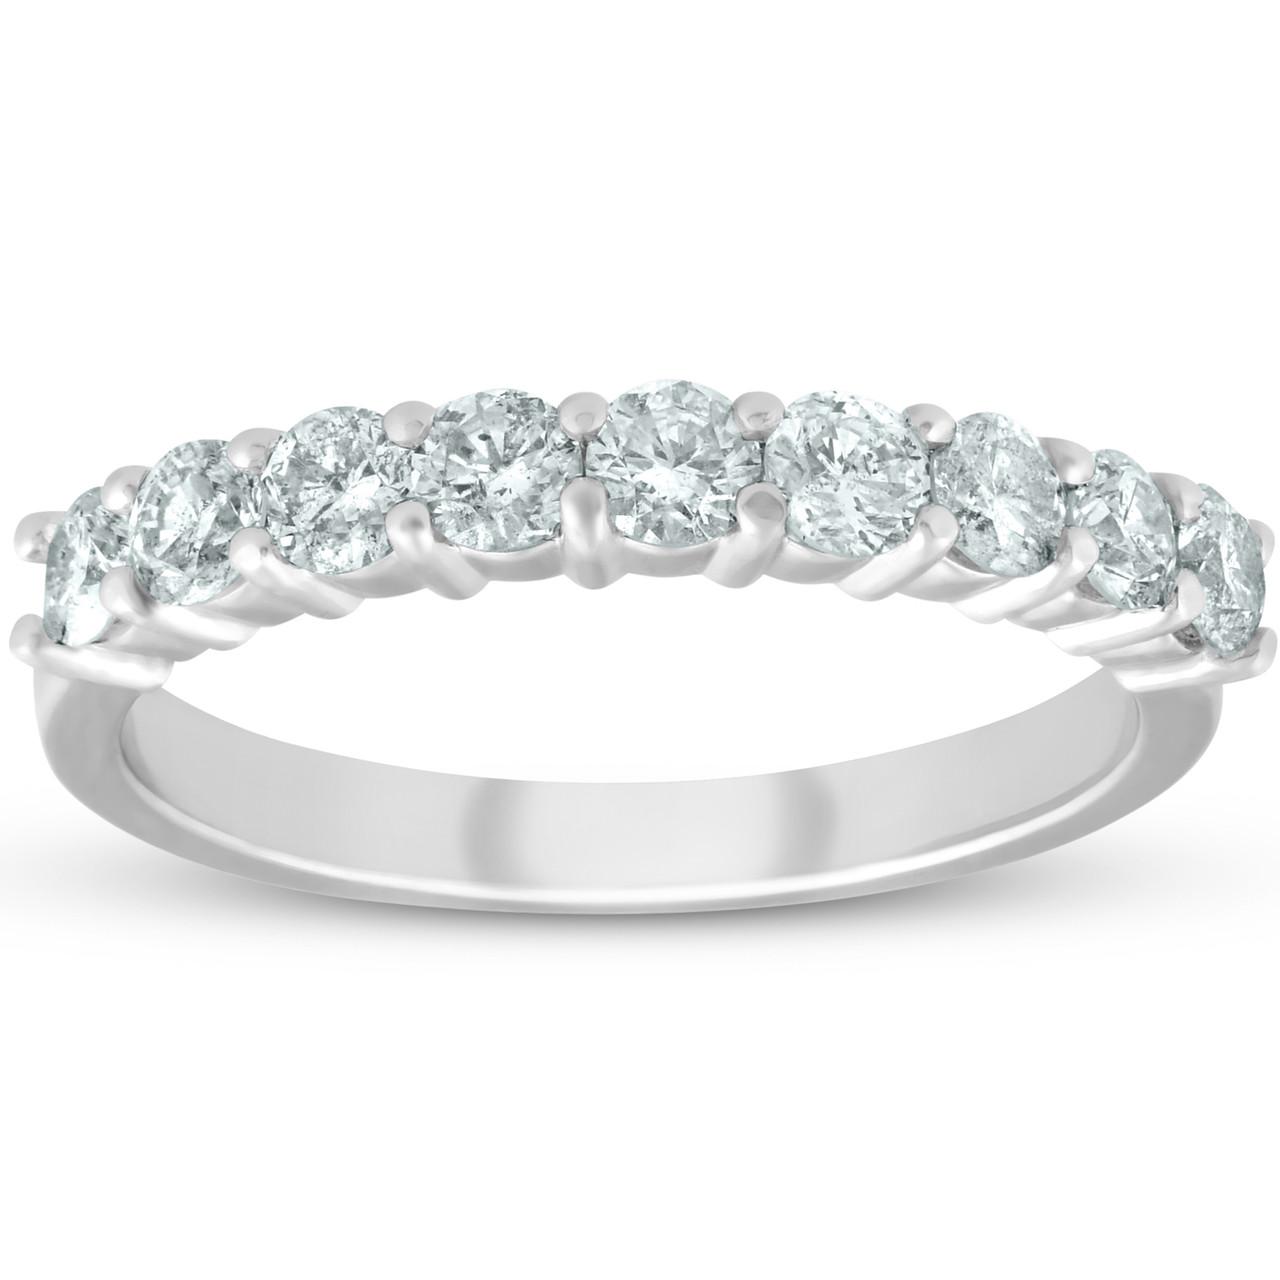 Womens Wedding Rings.1 2ct Diamond 9 Stone Womens Wedding Ring 14k White Gold G H Si 1 Si 2